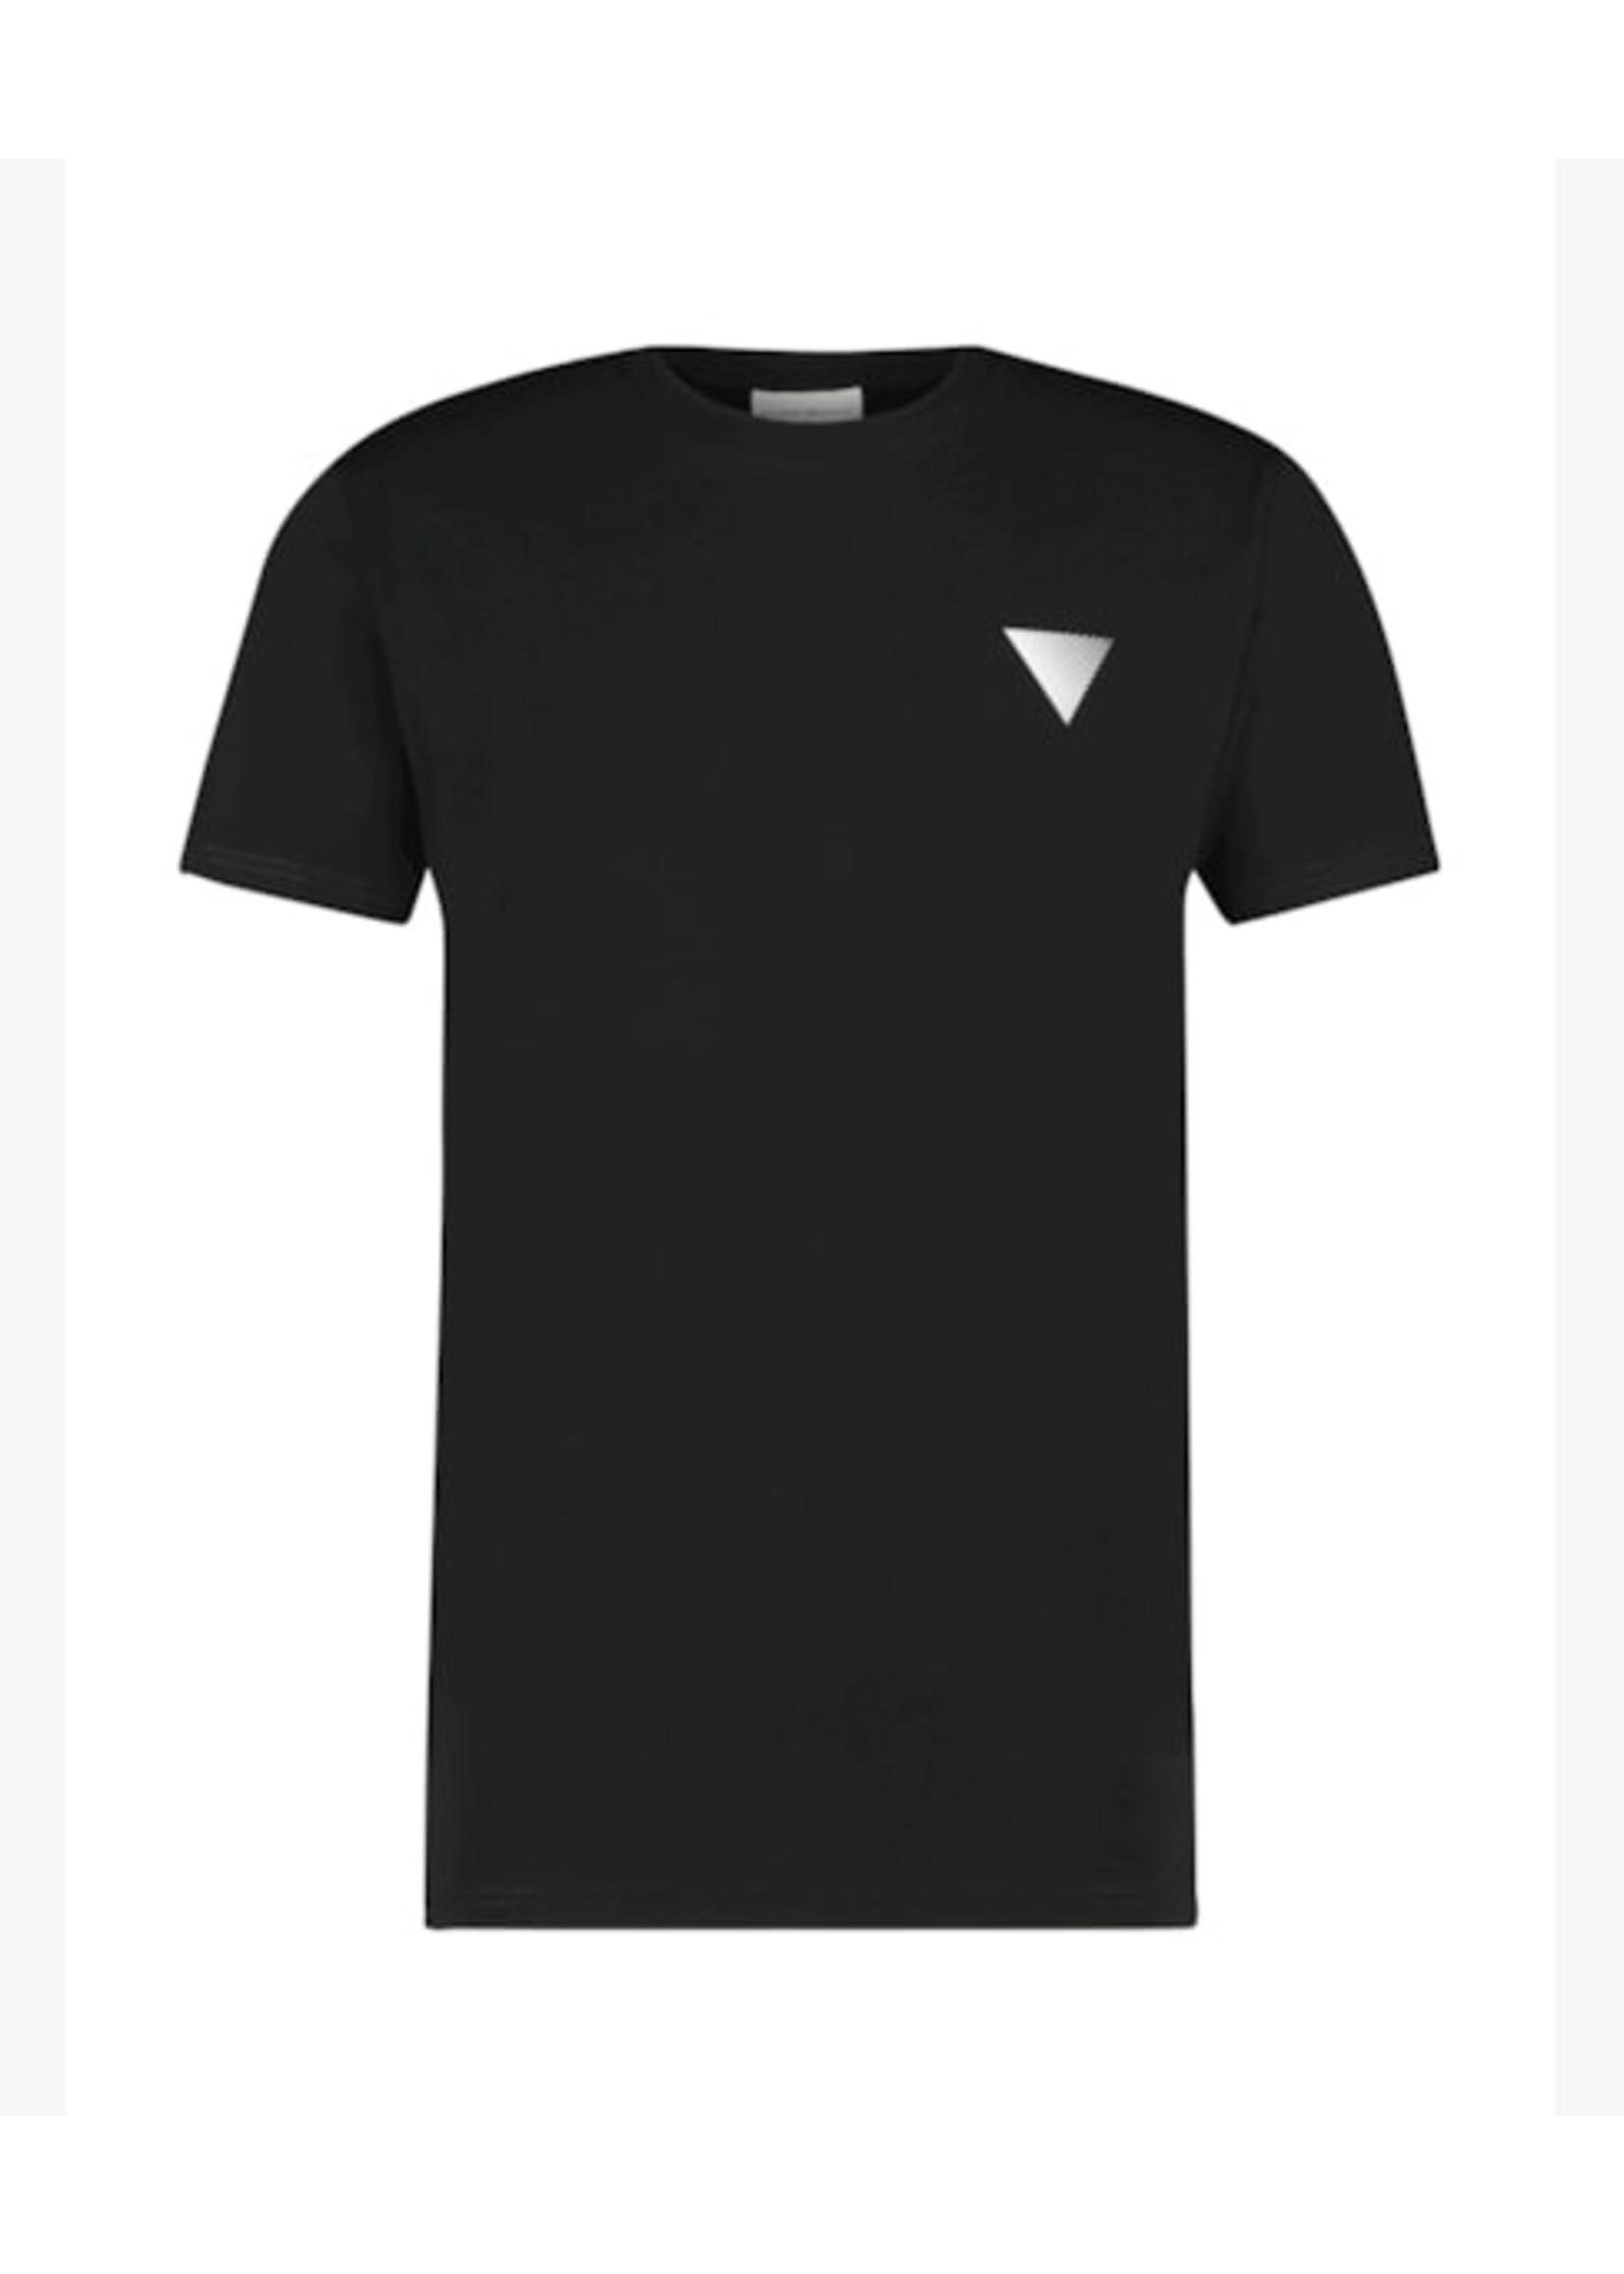 Purewhite Survivalist T-shirt - Black